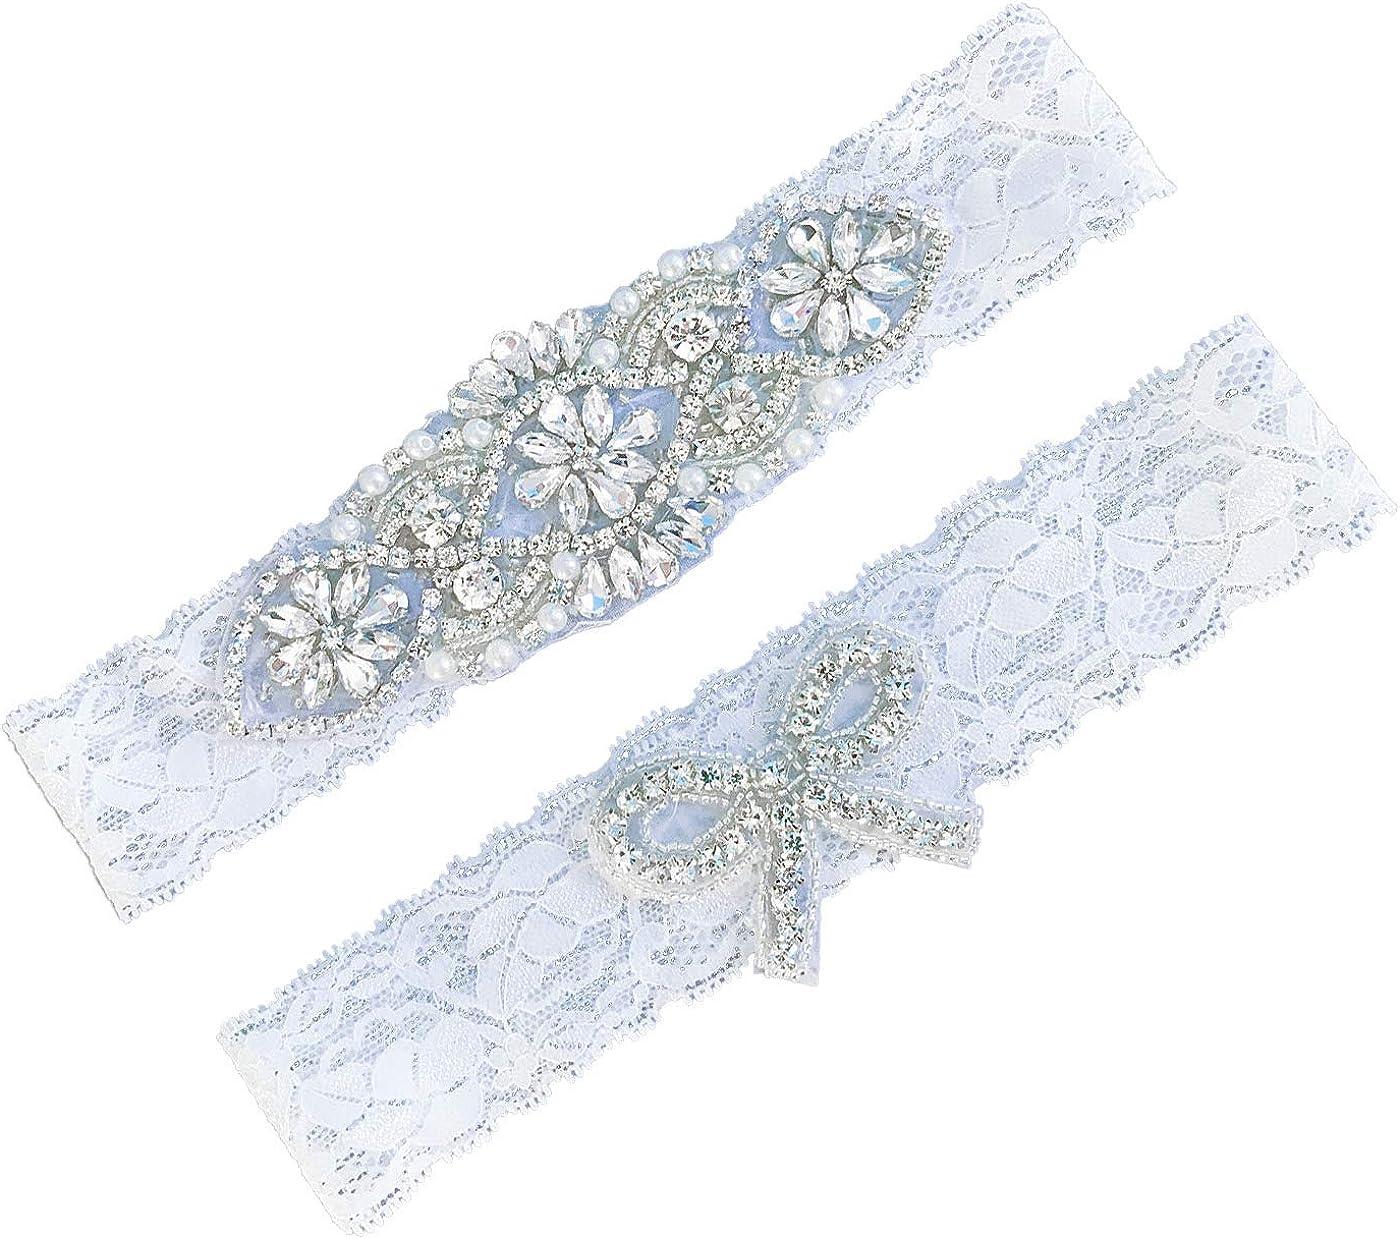 Bridal Garter Set Handmade Custom Garter Wedding Garter Daimond Applique Garter Wedding Rhinestone Garter Beaded Garter GTA0007